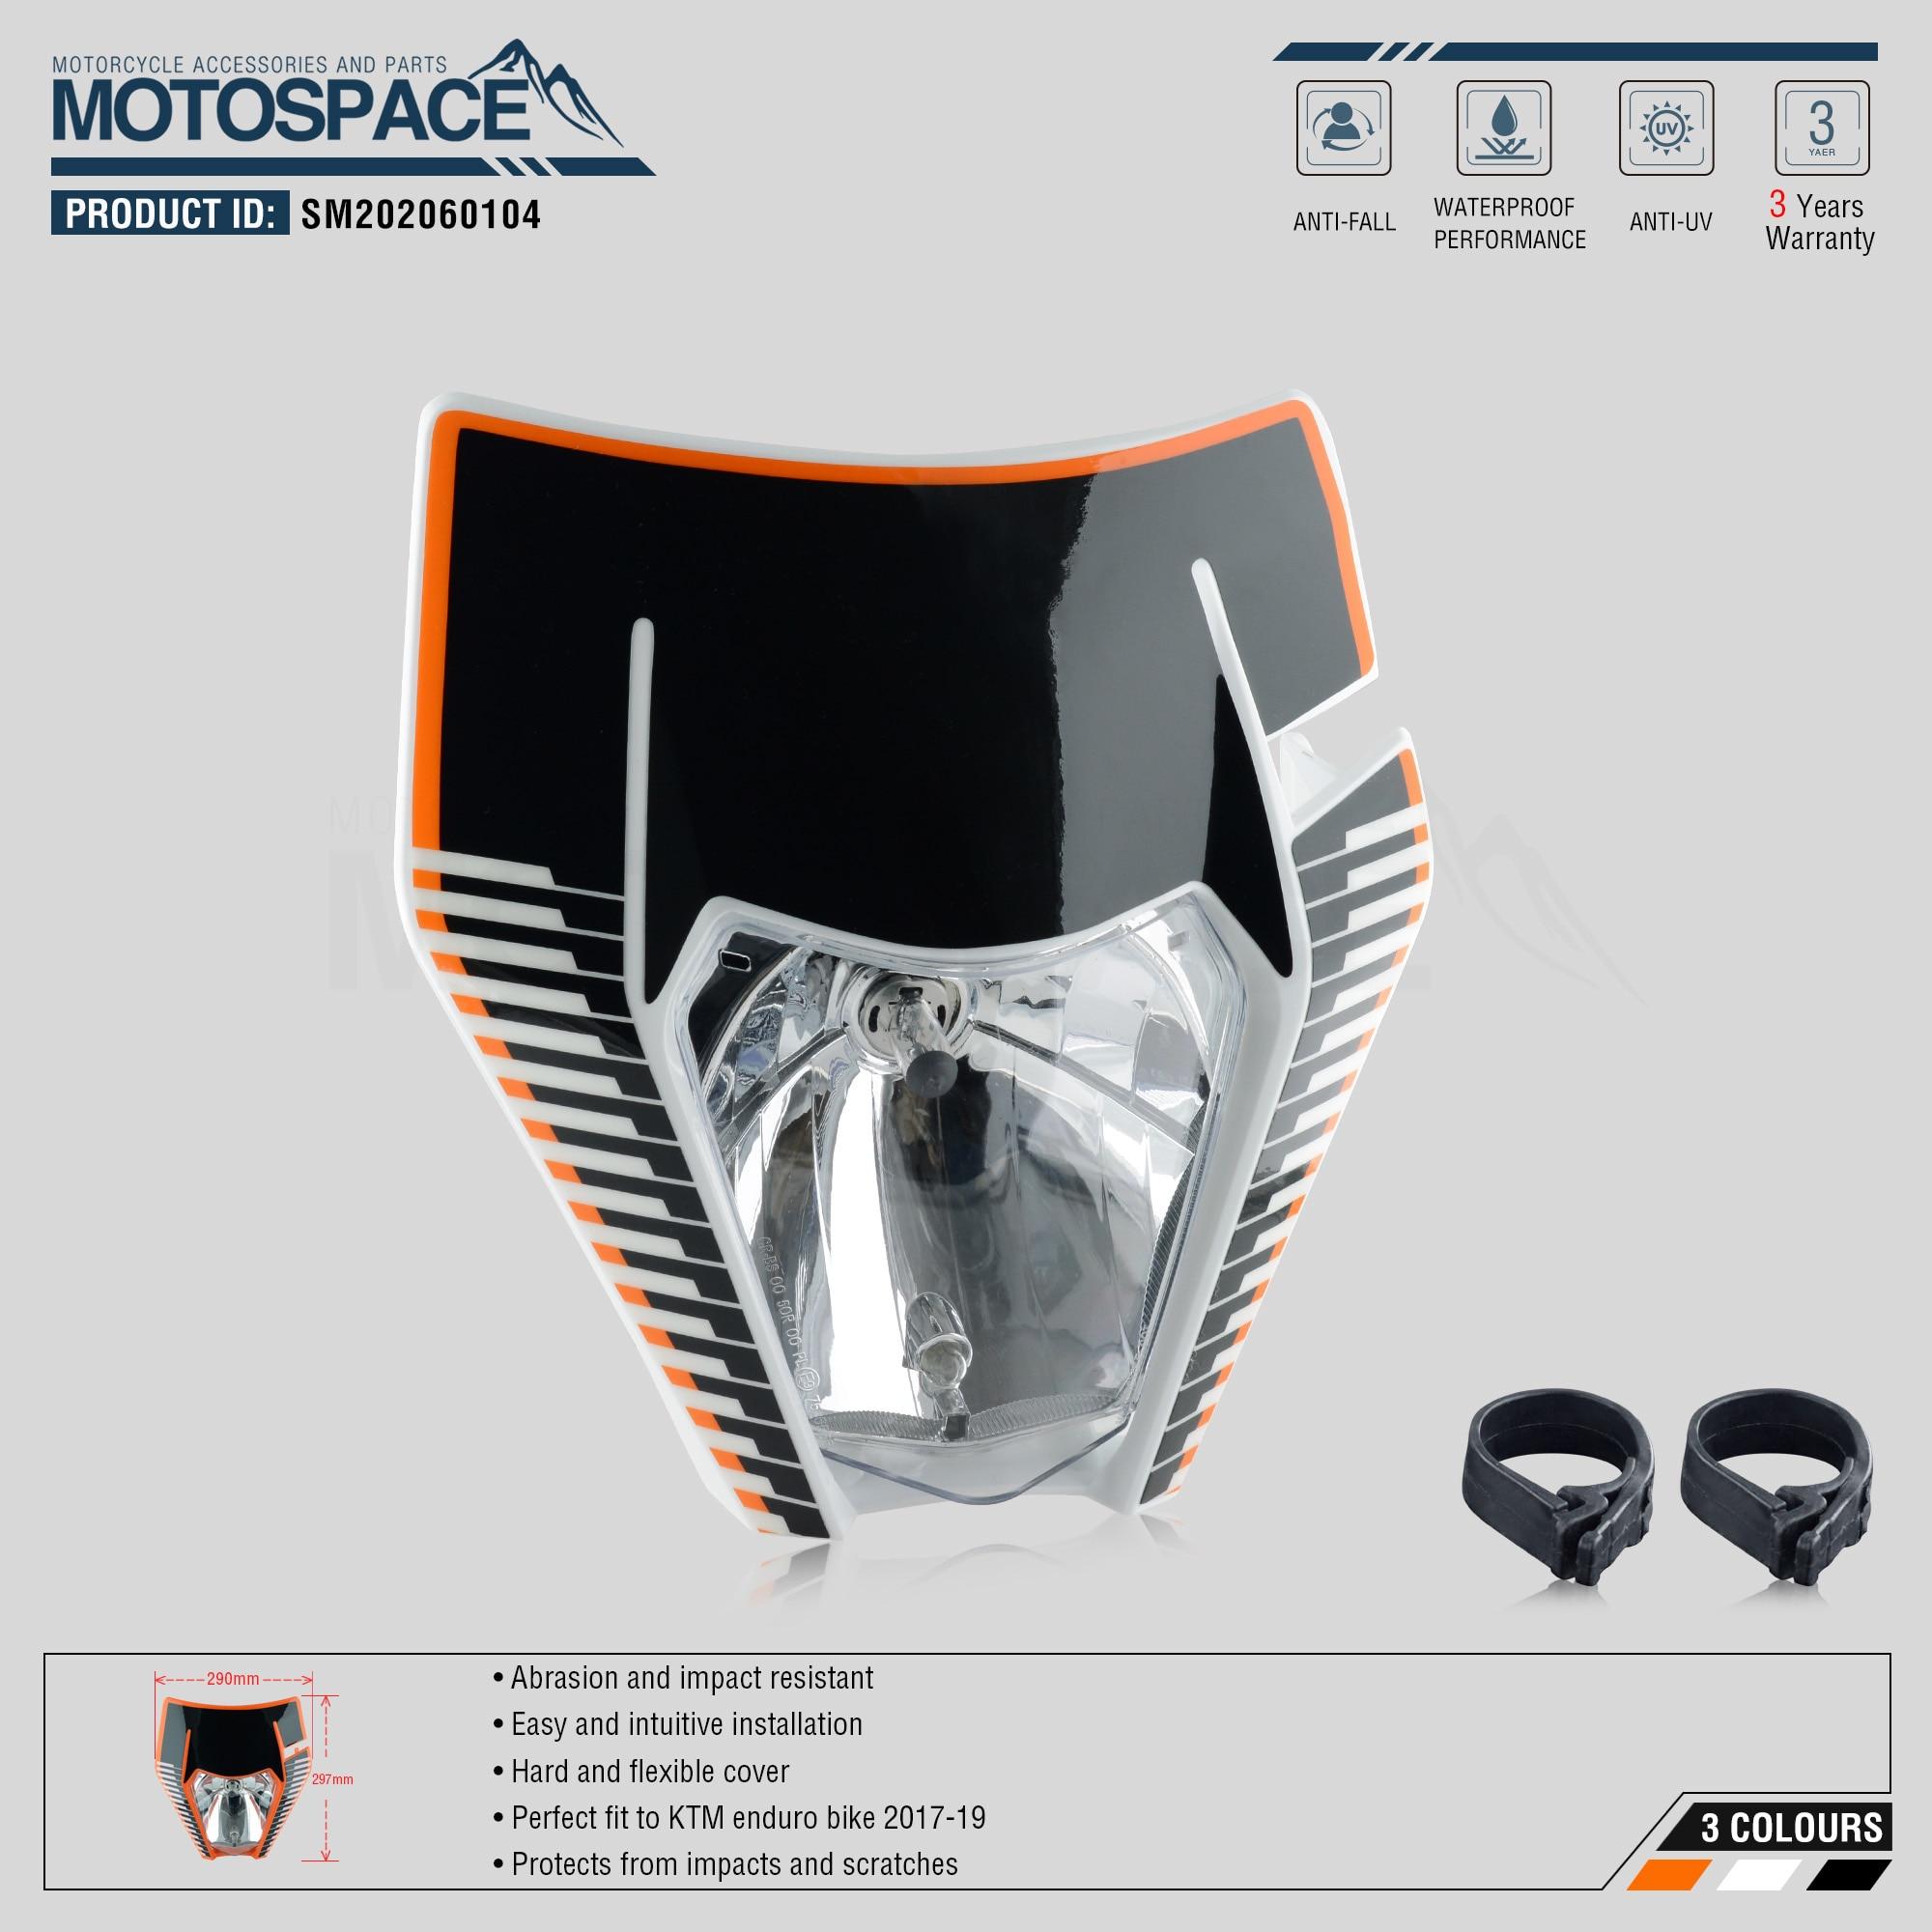 lowest price Spacemotors Headlight Headlamp With Sticker For KTM SX F EXC XCF SMR 2017 2018 2019 Motorcycle Dirt Bike MX Enduro Supermoto